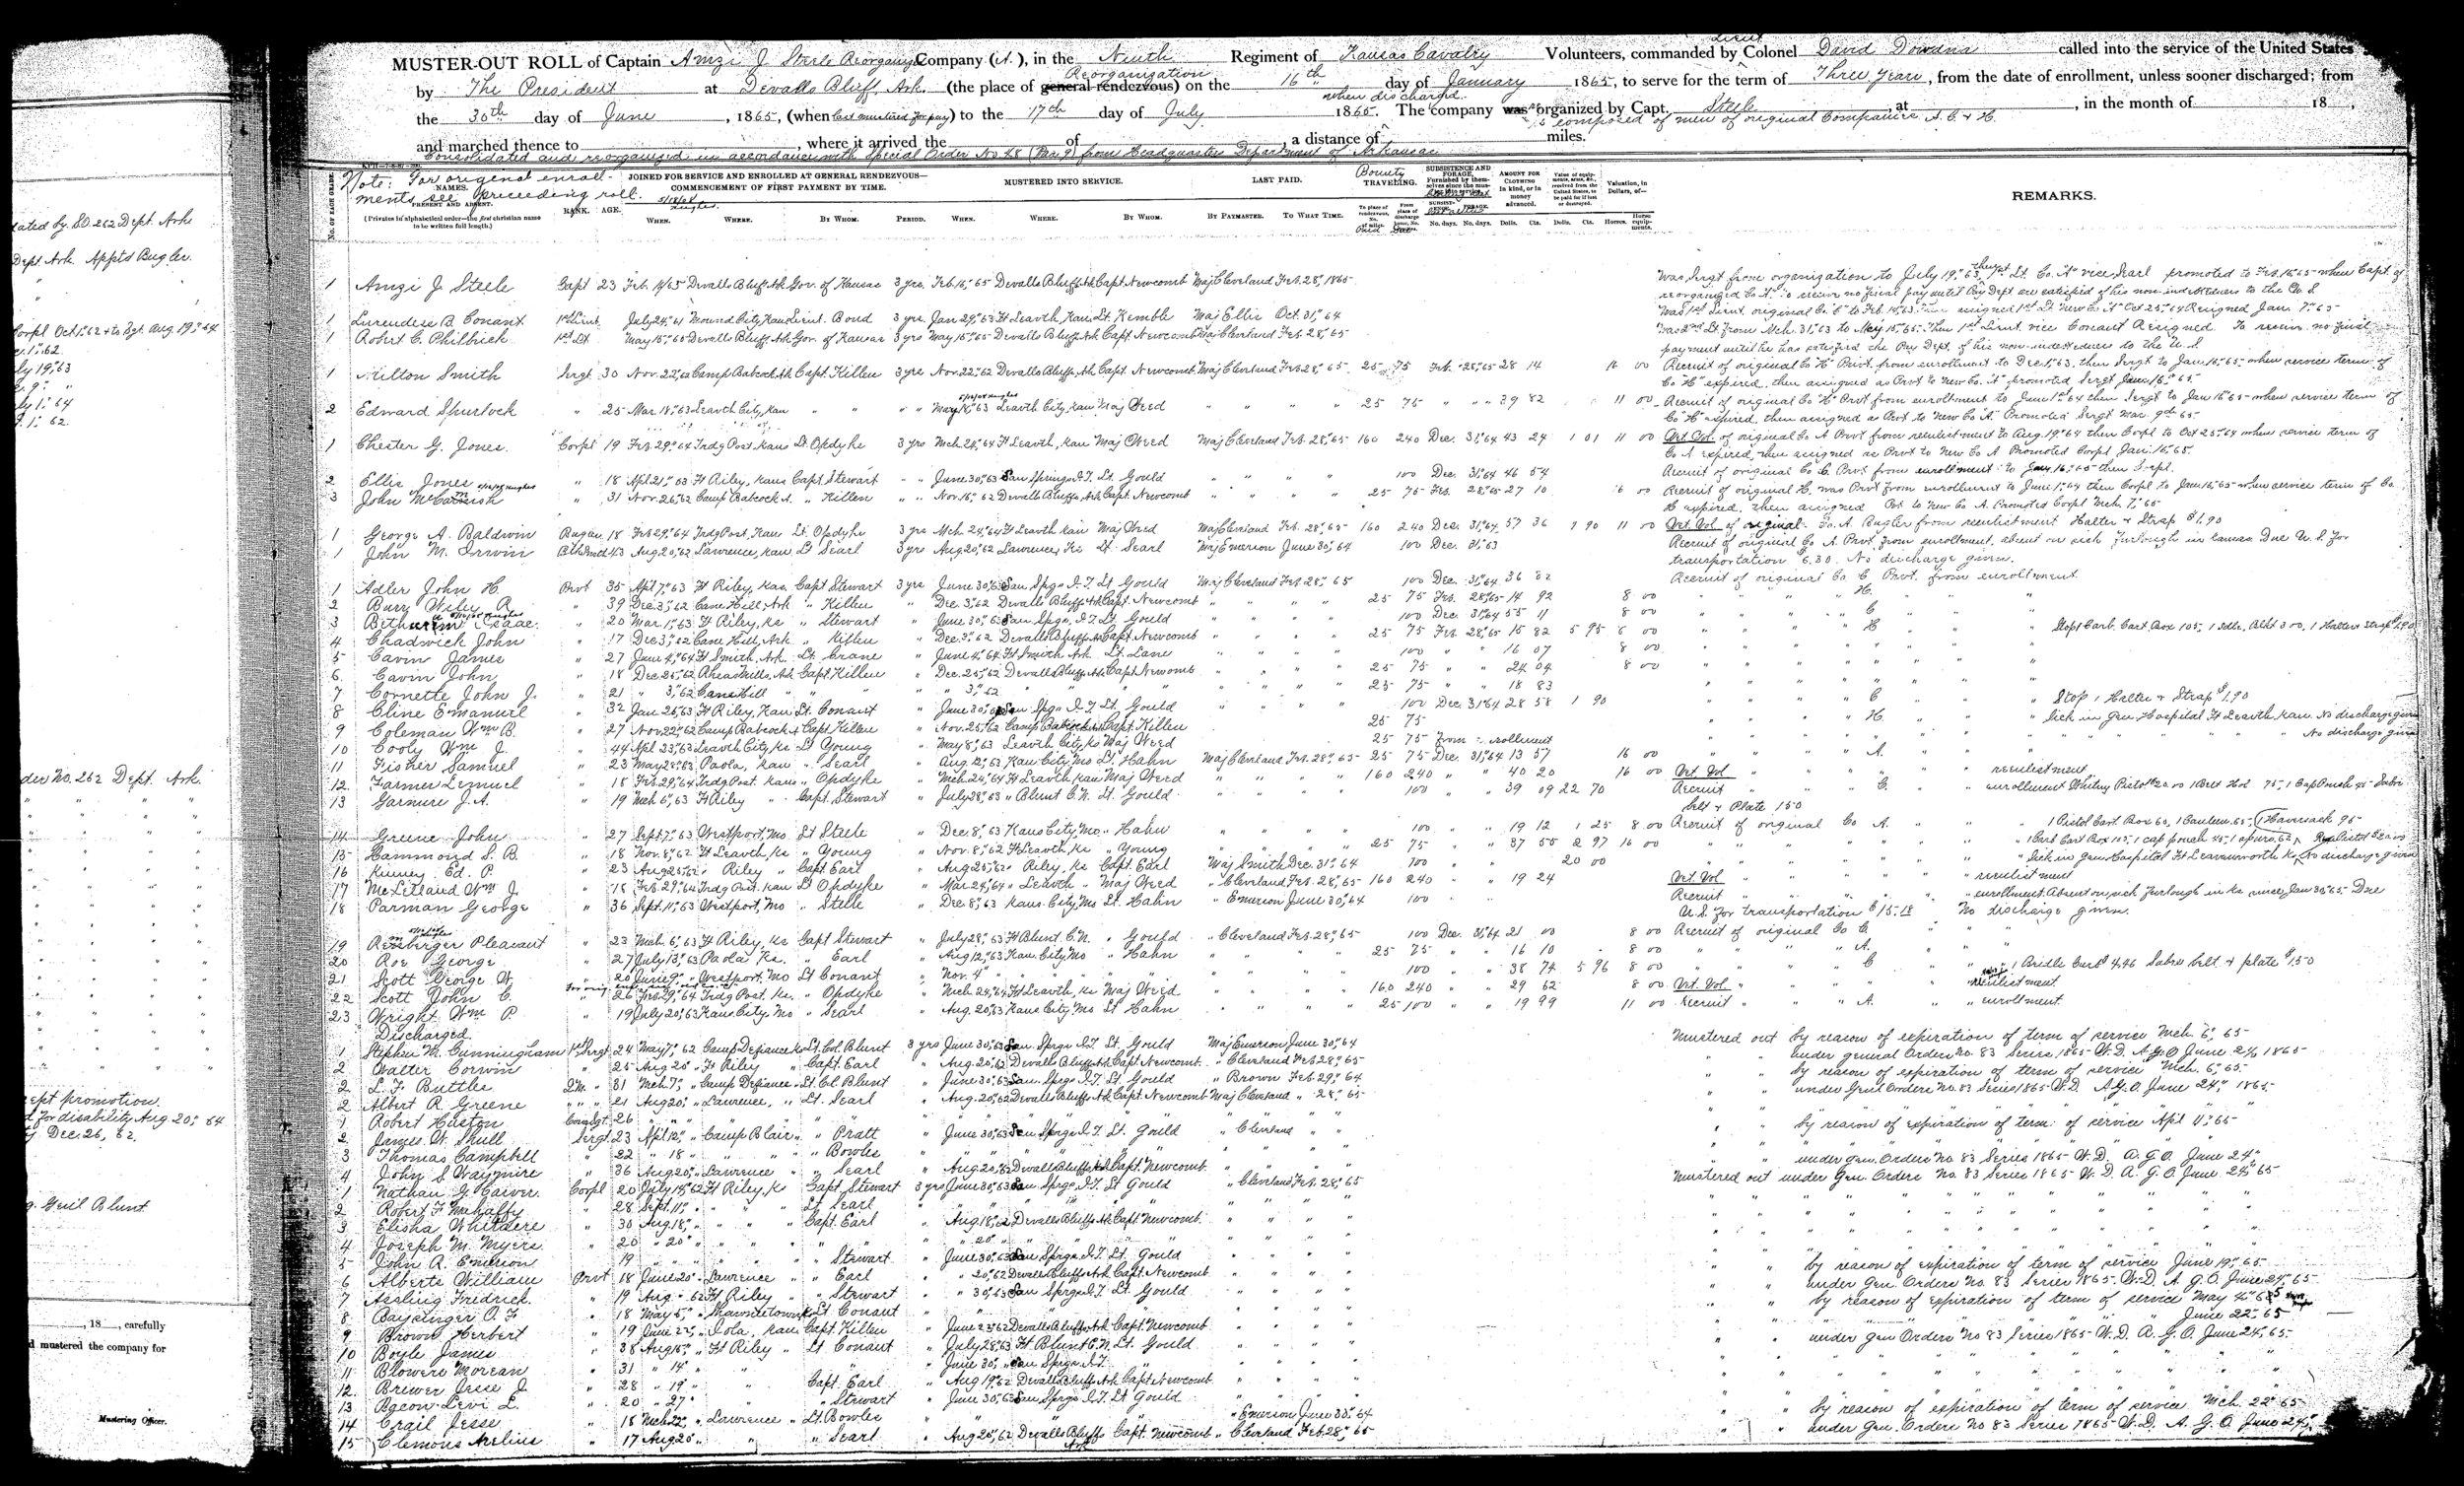 Muster out roll, Ninth Regiment, Cavalry, Kansas Civil War Volunteers regiment, volume 3 - 8